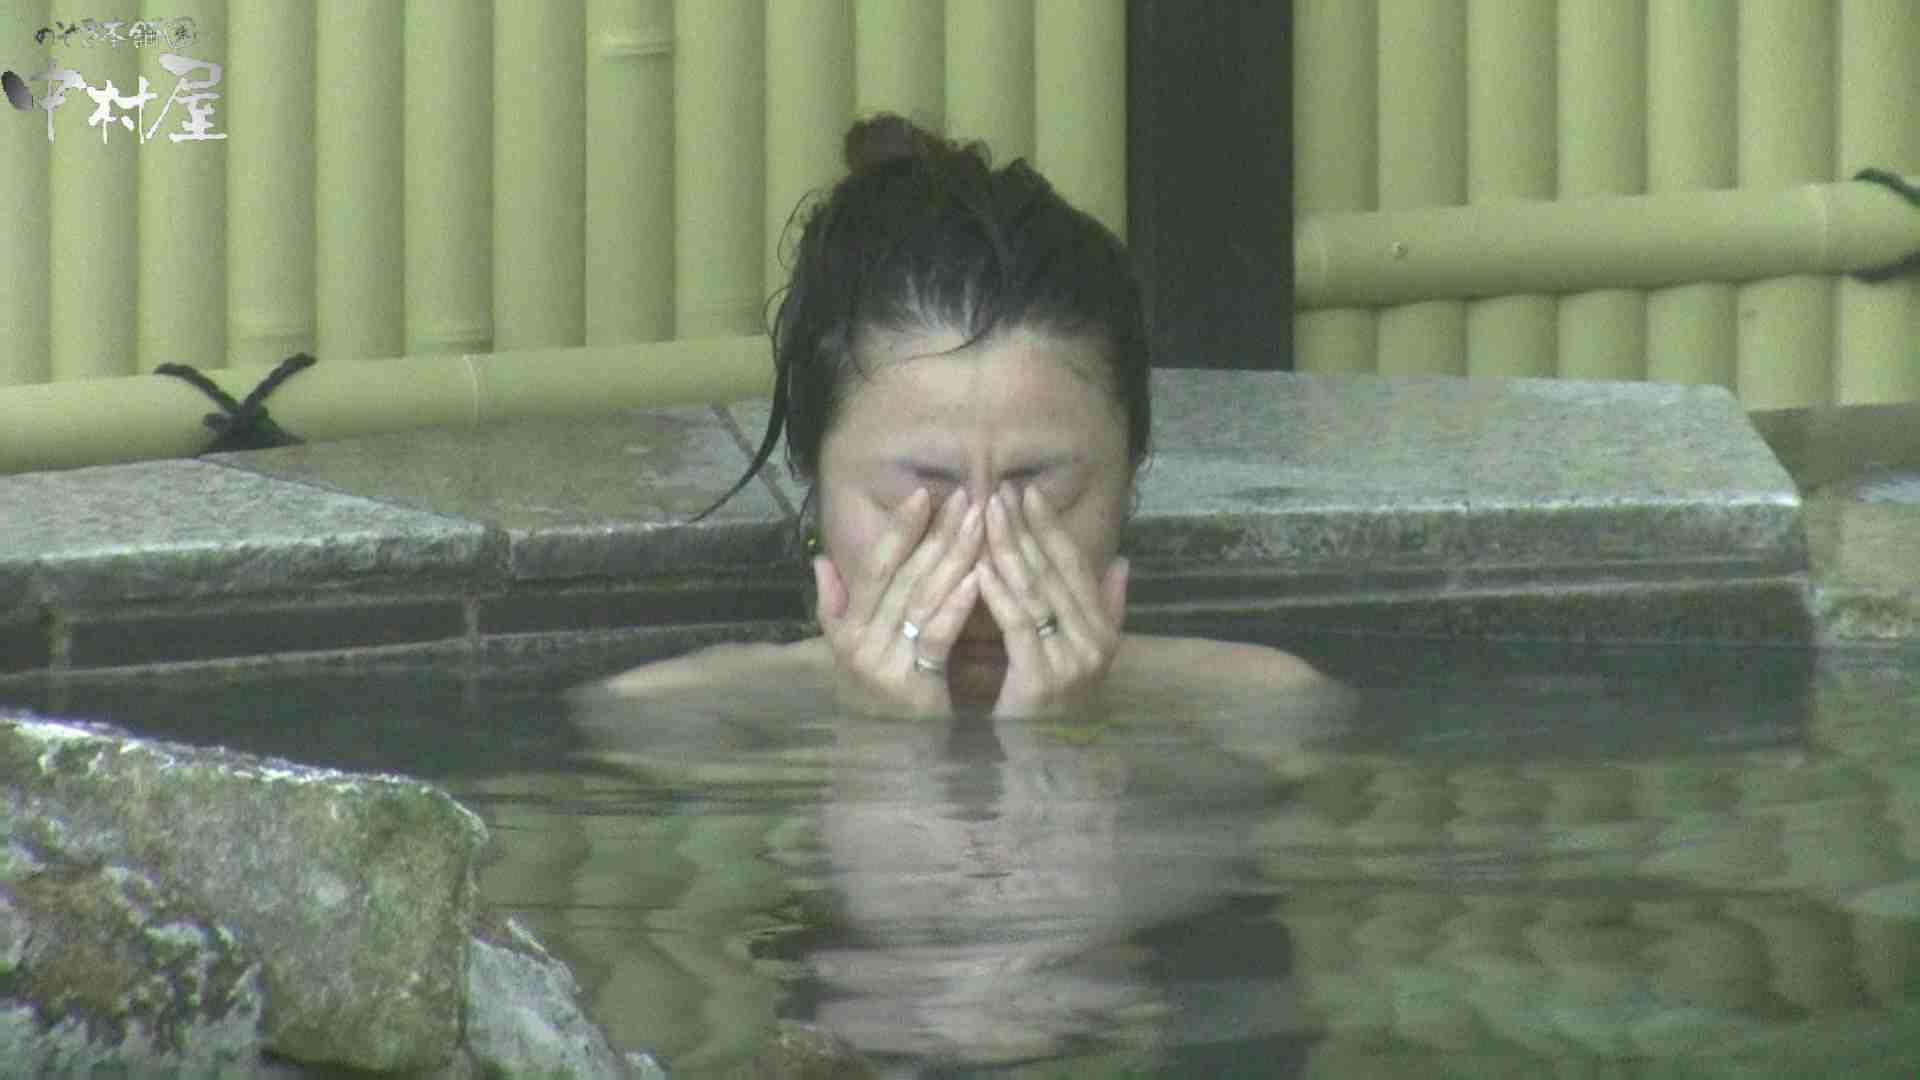 Aquaな露天風呂Vol.969 露天風呂編  113PIX 12